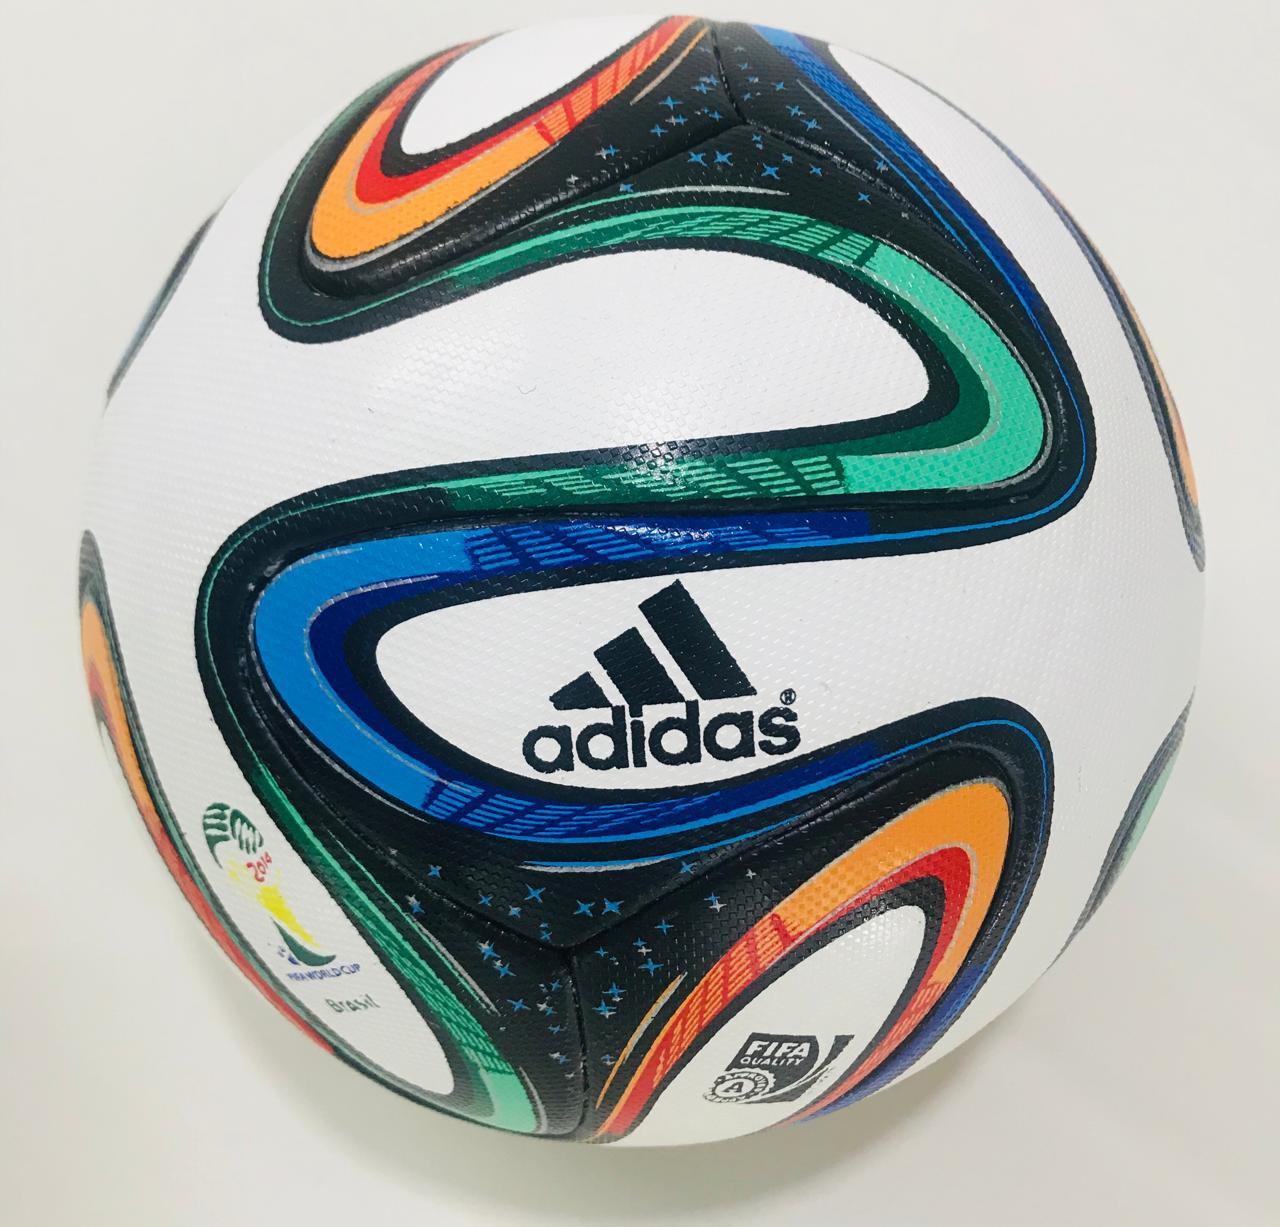 NEW ADIDAS BRAZUCA FIFA WORLD CUP 2014 BRAZIL OFFICIAL SOCCER MATCH BALL SIZE 5